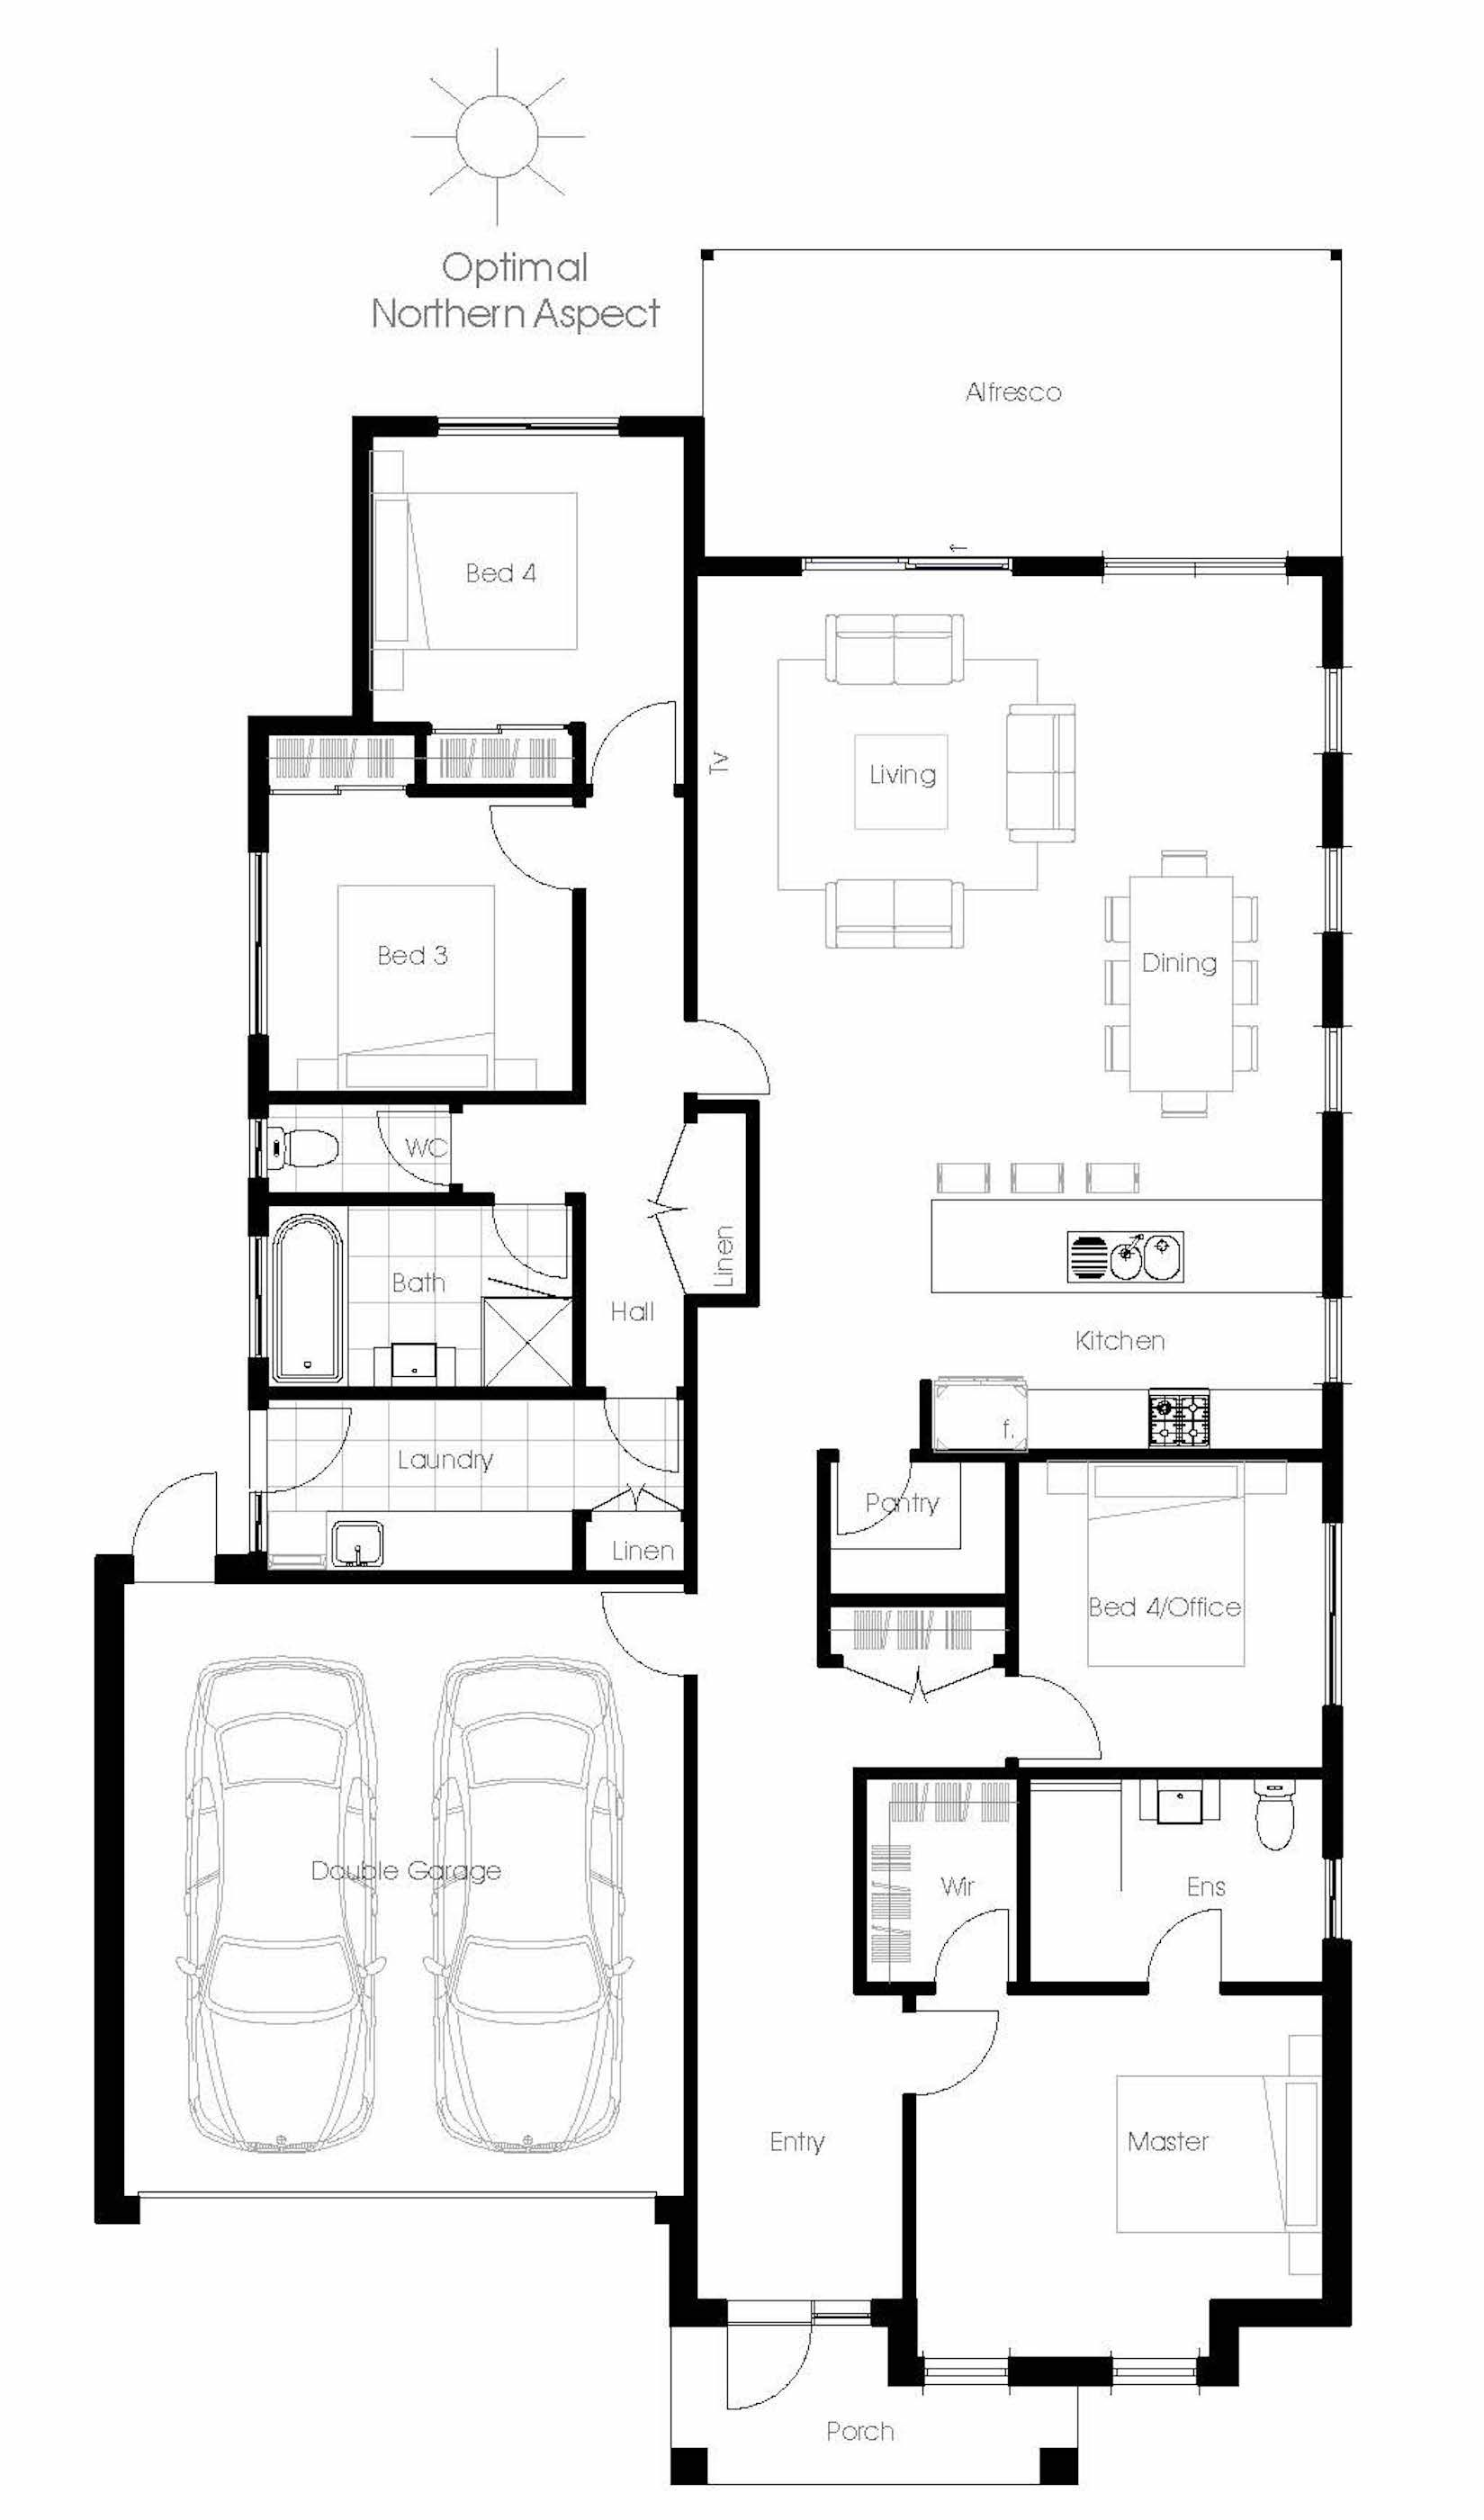 avalon - energy efficient home design - green homes australia